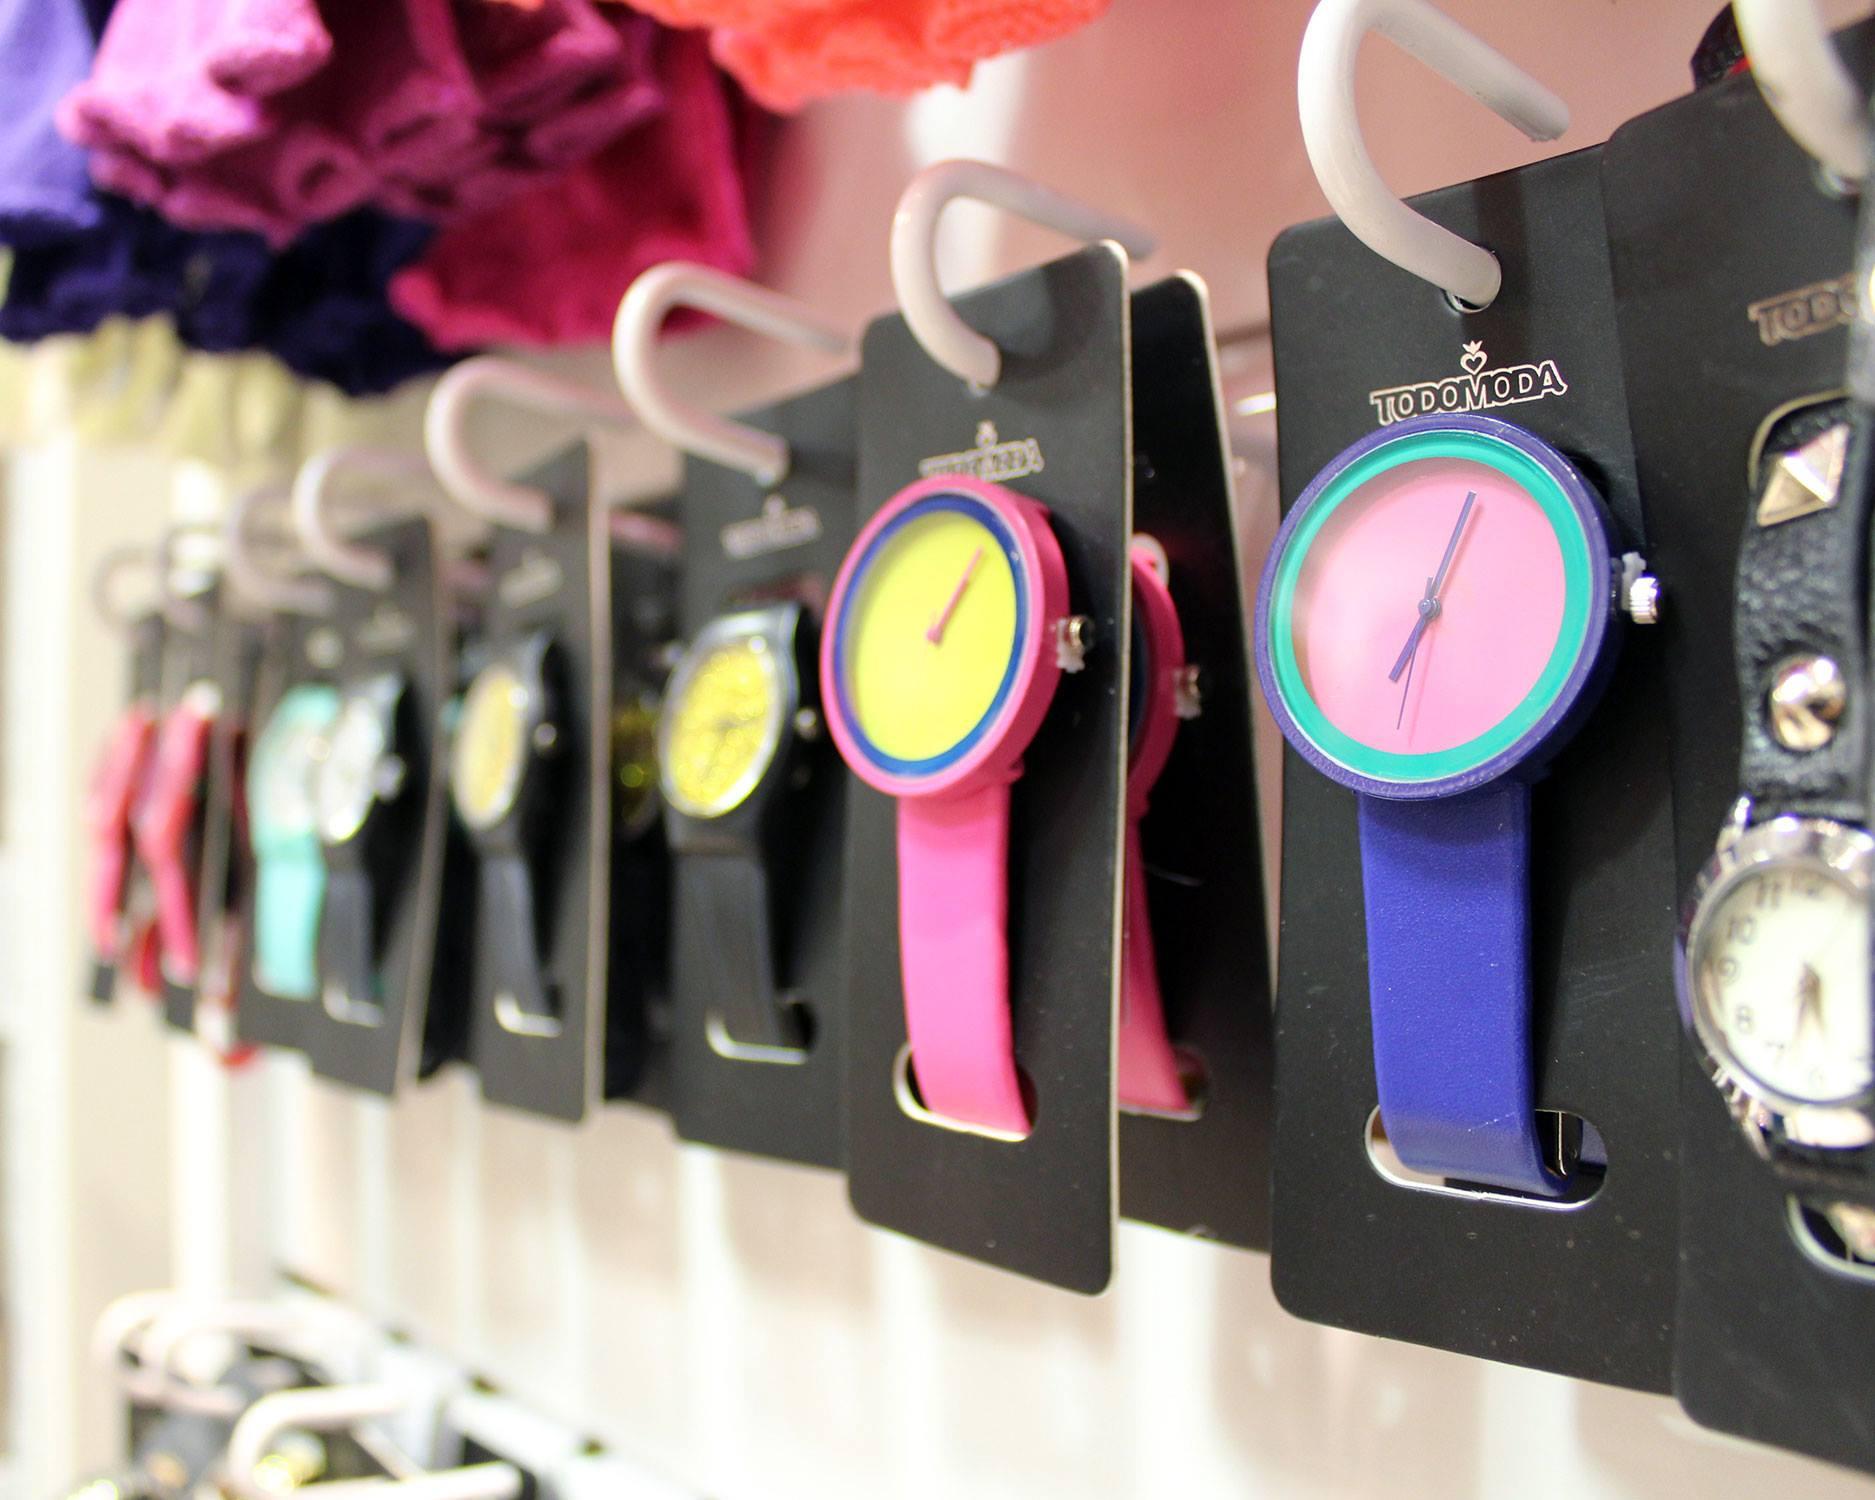 Relojes Todo Moda